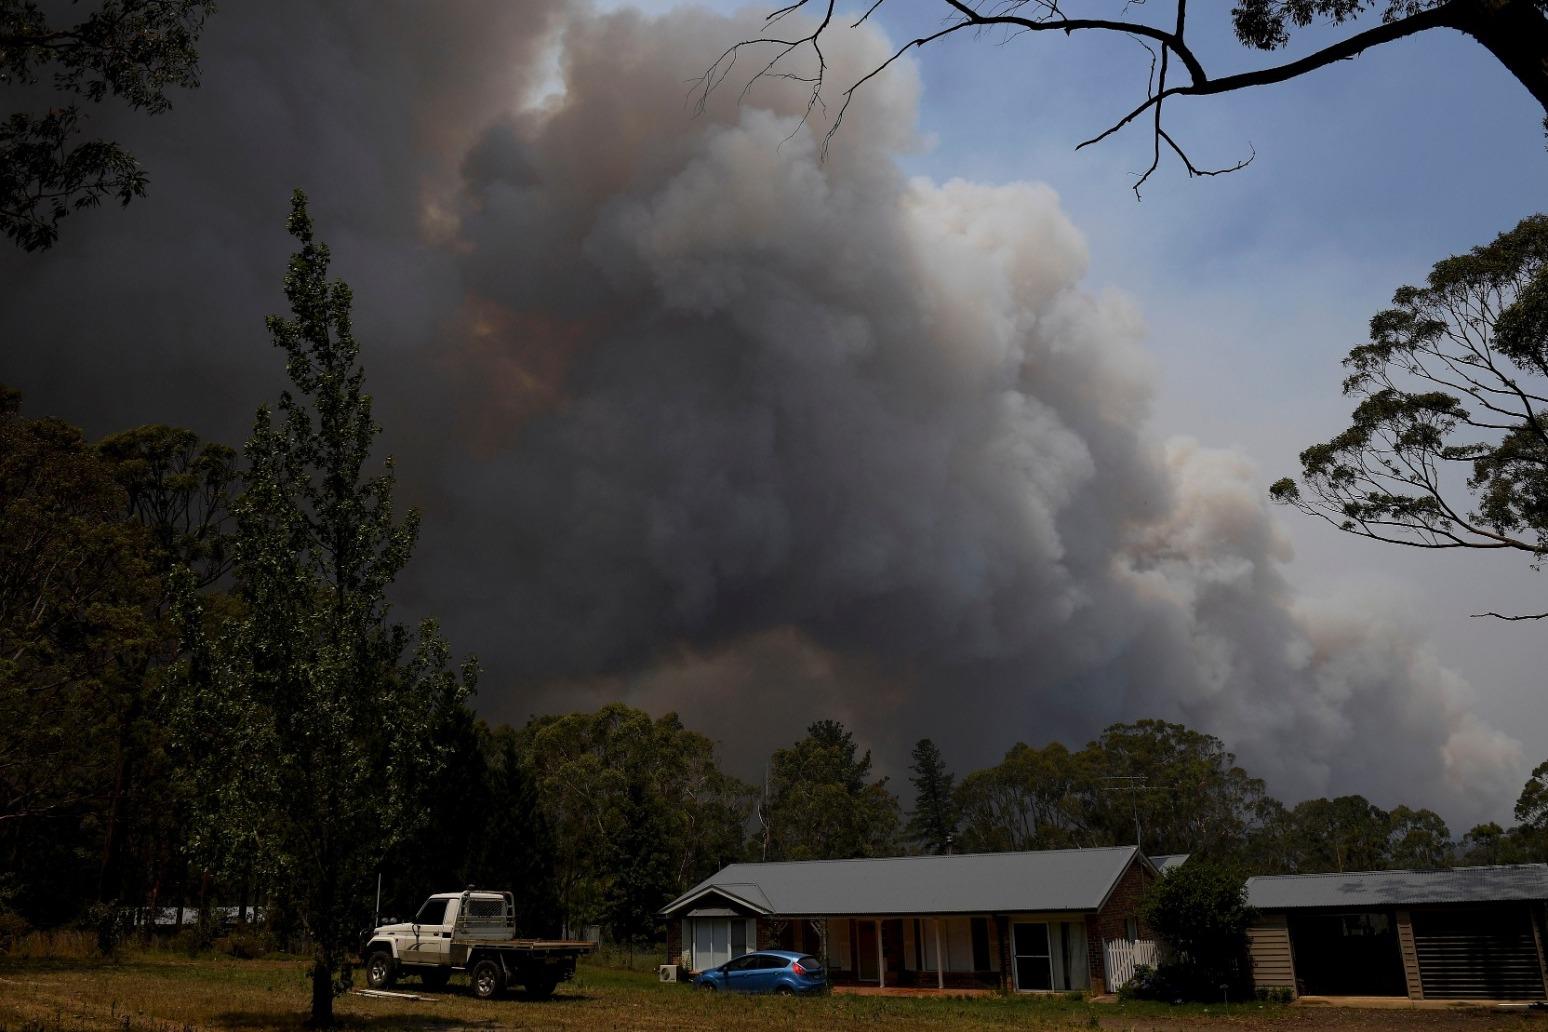 \'CATASTROPHIC\' FIRES CONTINUE TO SAVAGE AUSTRALIA